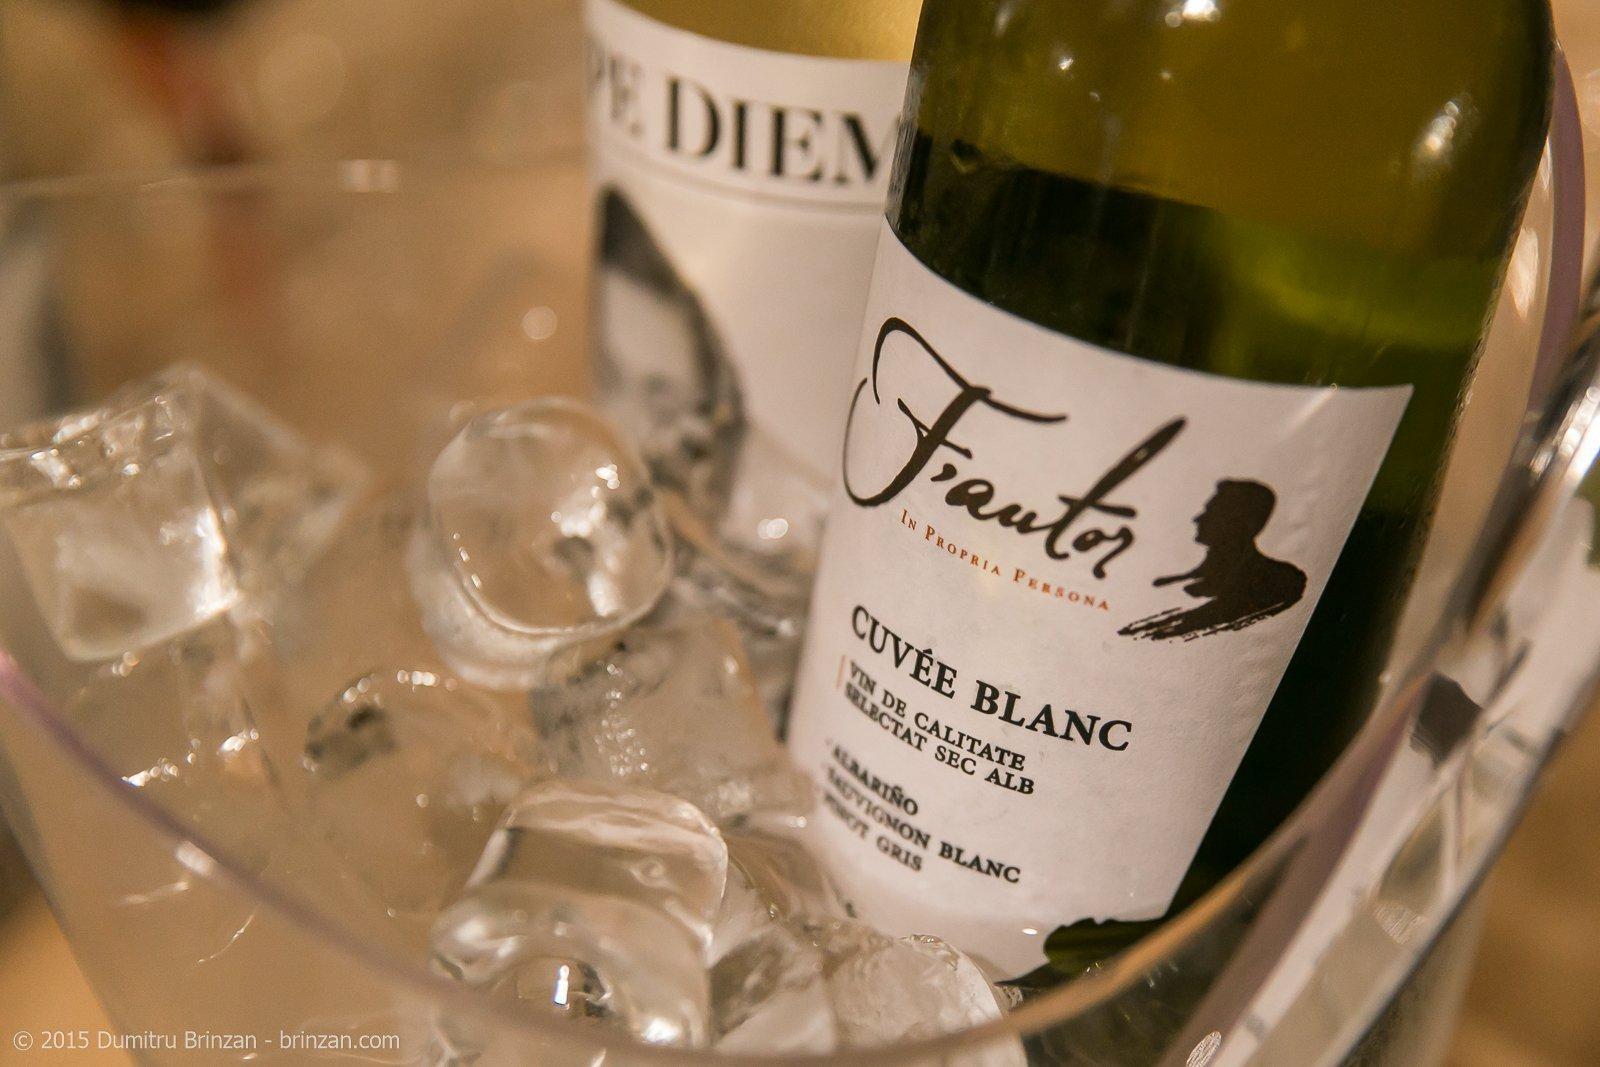 Bottles of Carpe Diem Feteasca Regala 2014 and F'autor Cuvee Blanc 2014 in Bucket of Ice